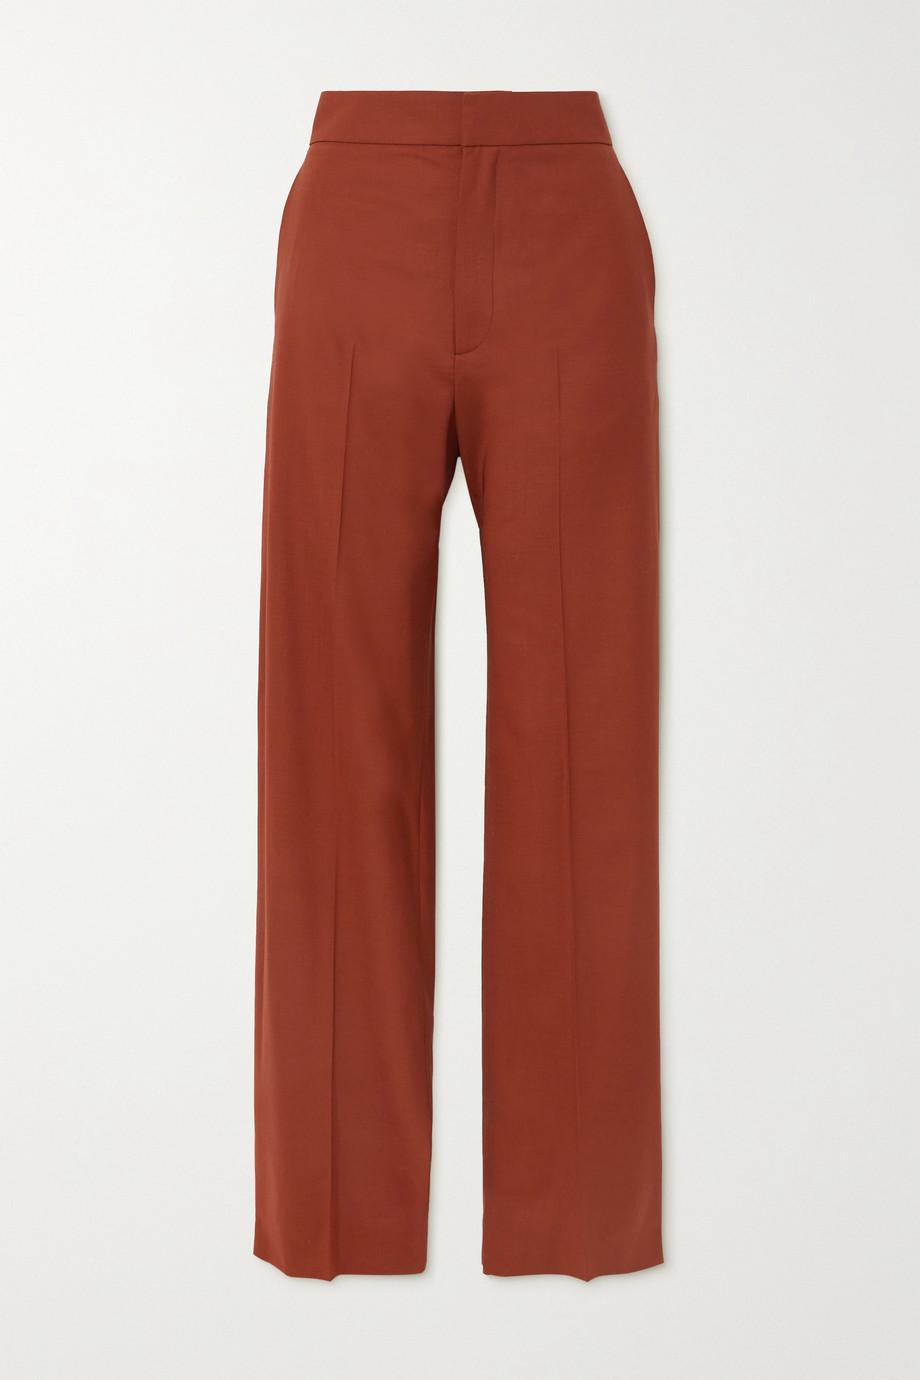 GAUCHERE Seline pleated wool-blend wide-leg pants